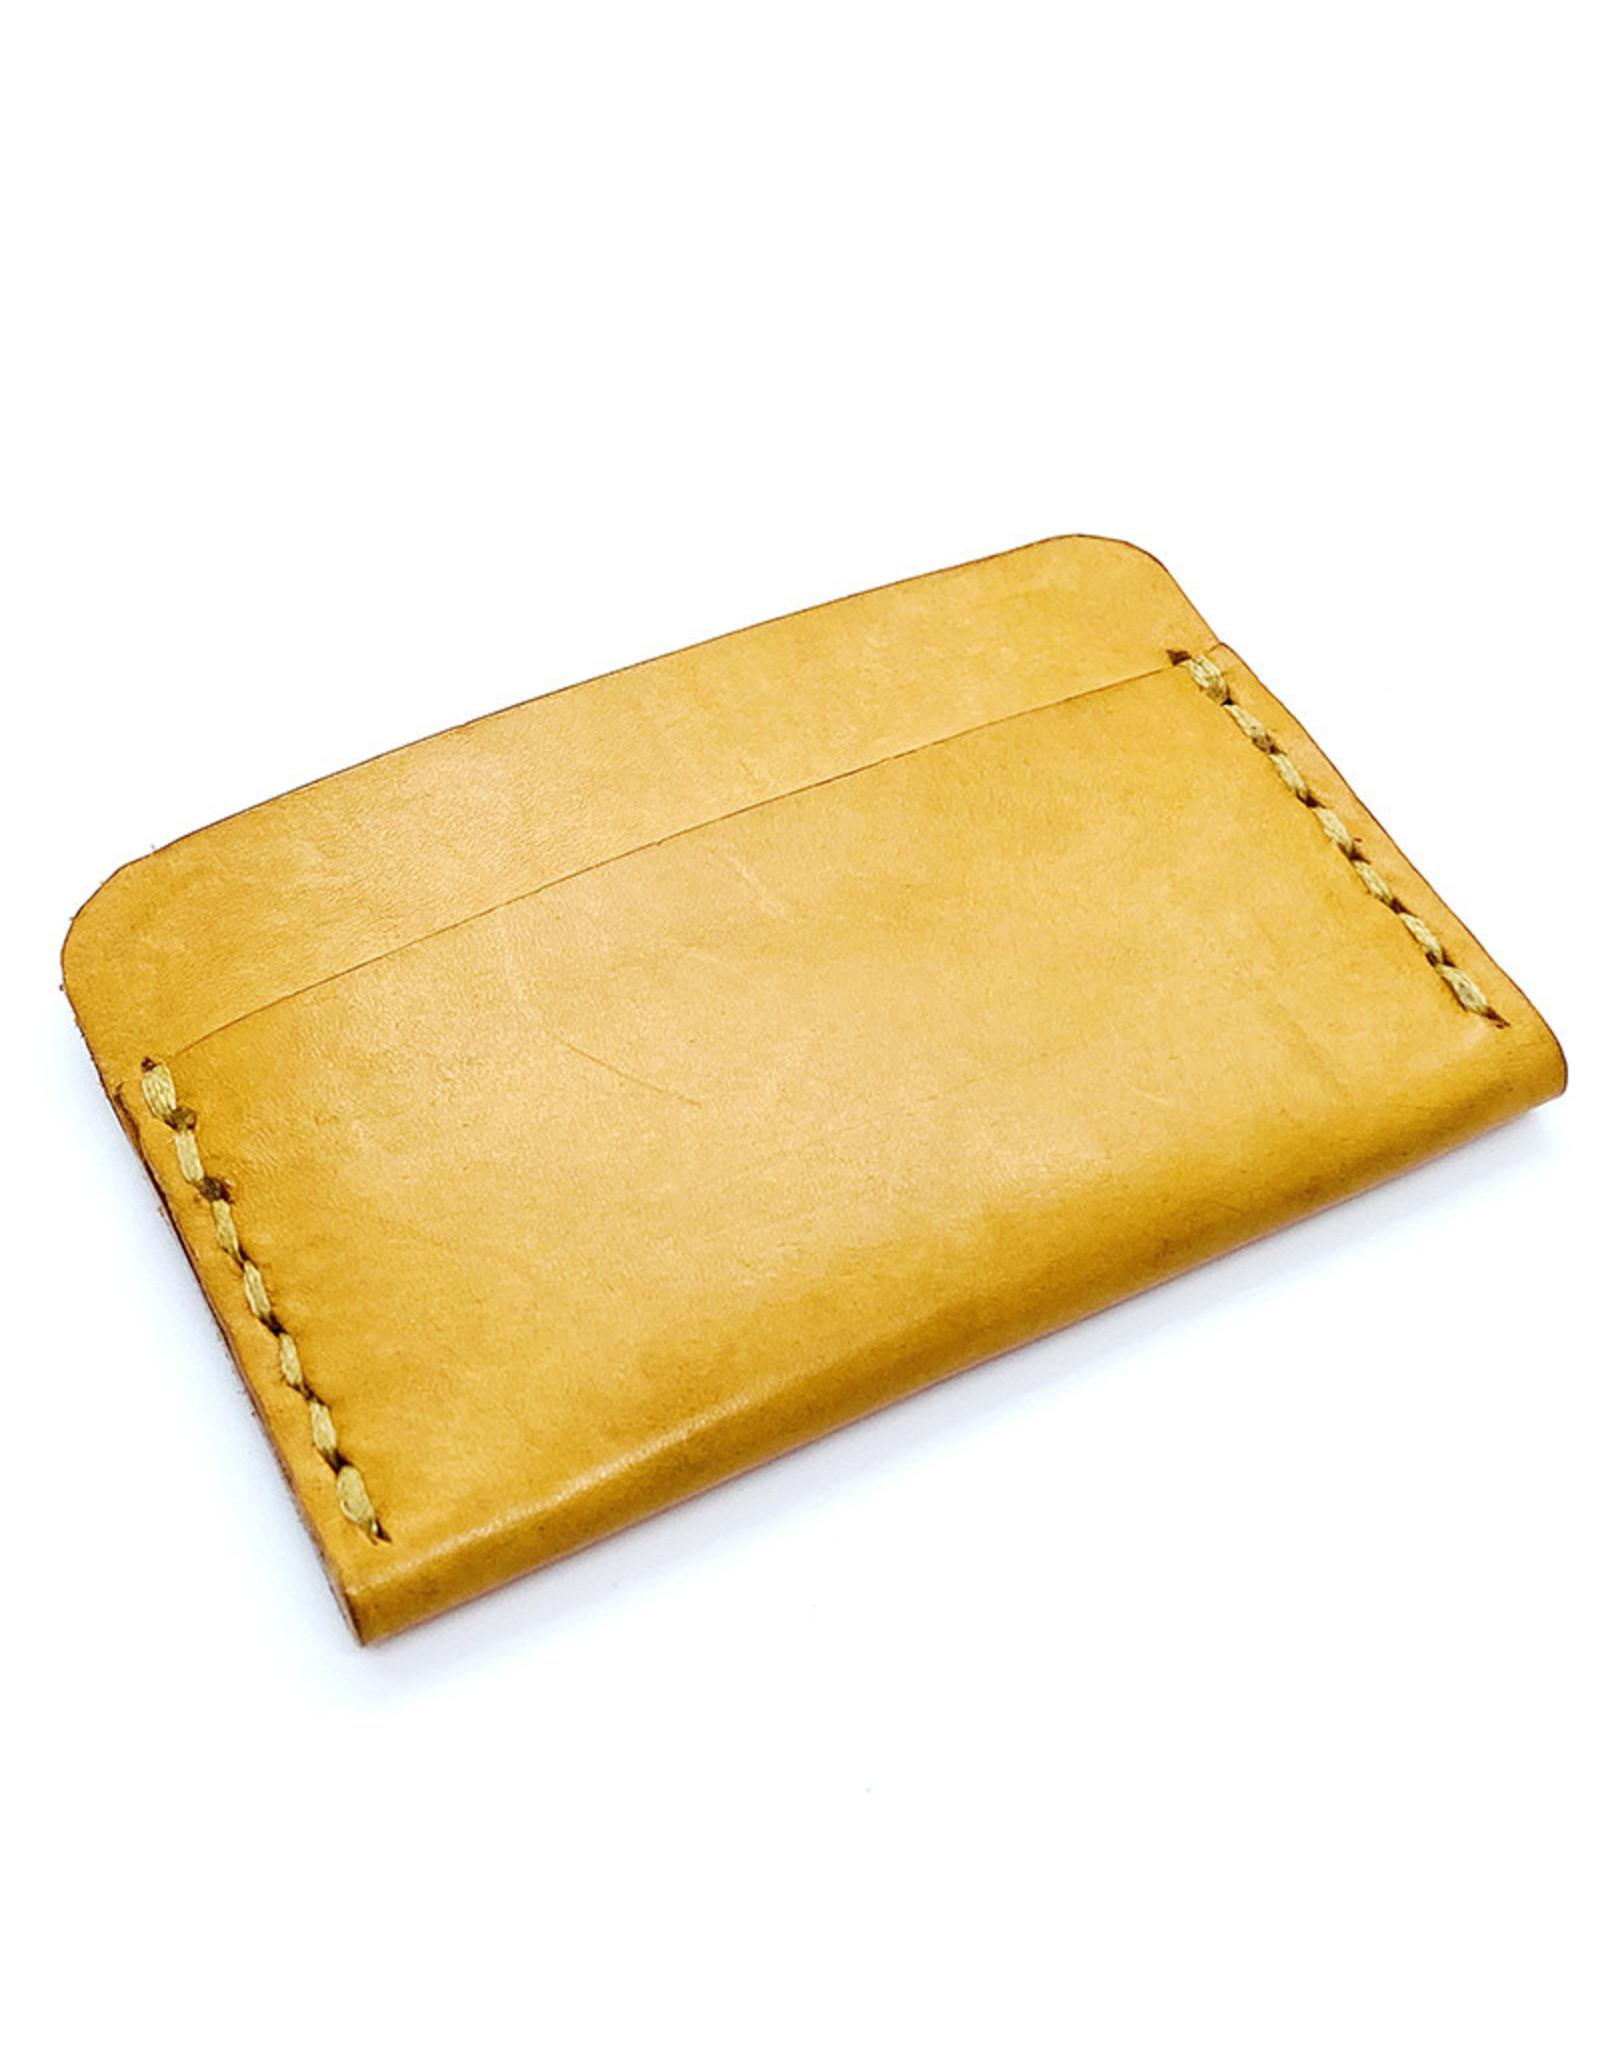 Madison Street Leather Minimalist Wallets by Madison Street Leather